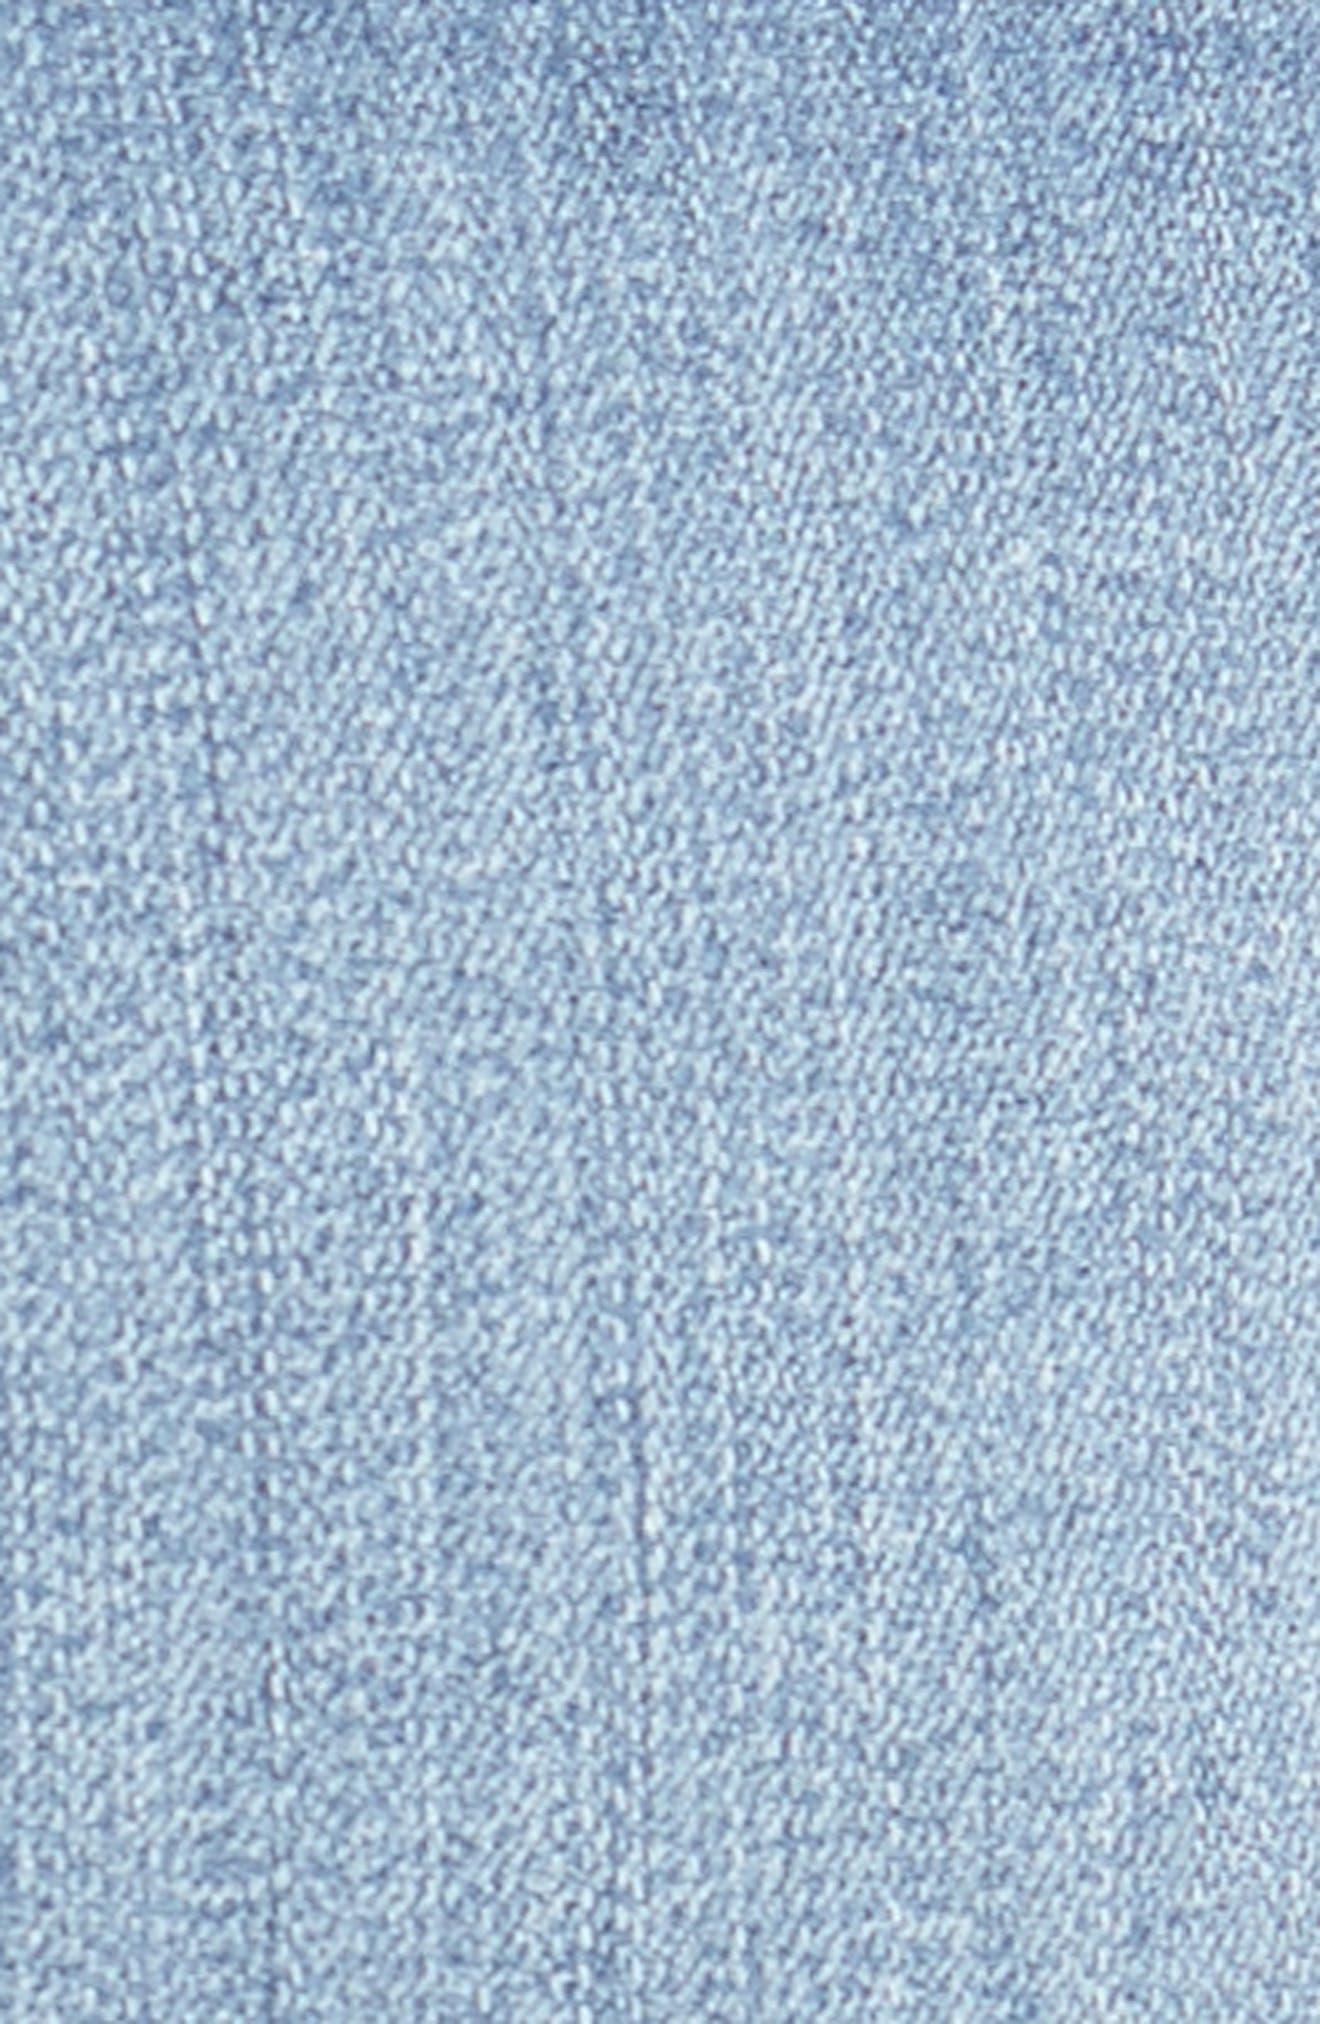 Alternate Image 5  - Wit & Wisdom Ab-solution Cuffed Denim Shorts (Regular & Petite) (Nordstrom Exclusive)